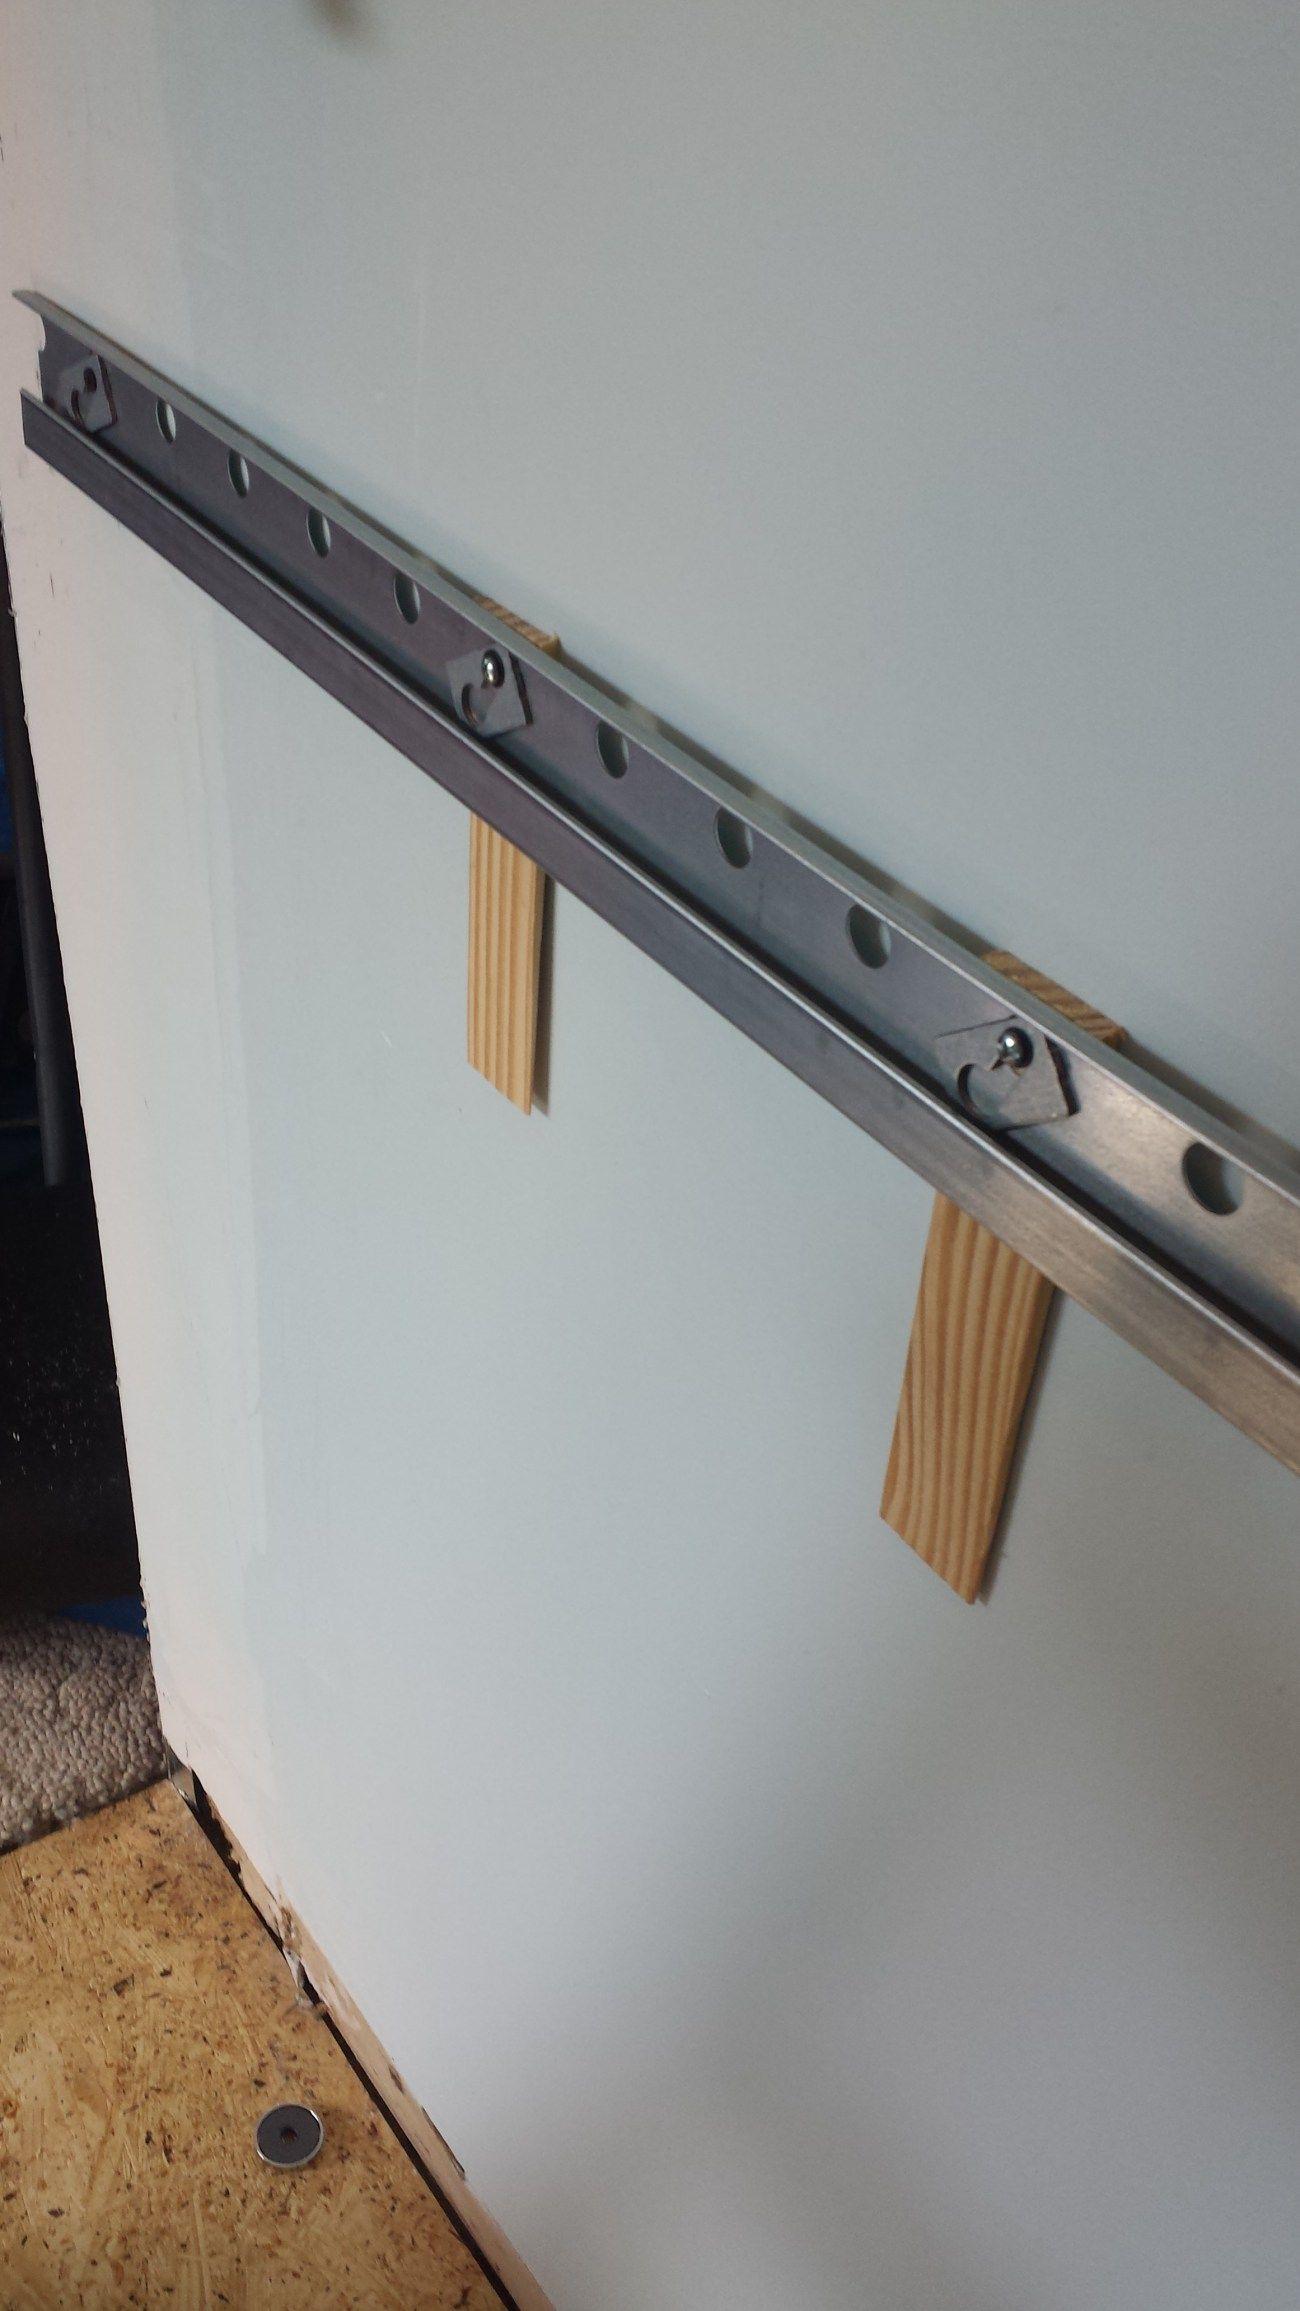 Installing IKEA kitchen cabinets the DIY way | IKEA kitchen ...